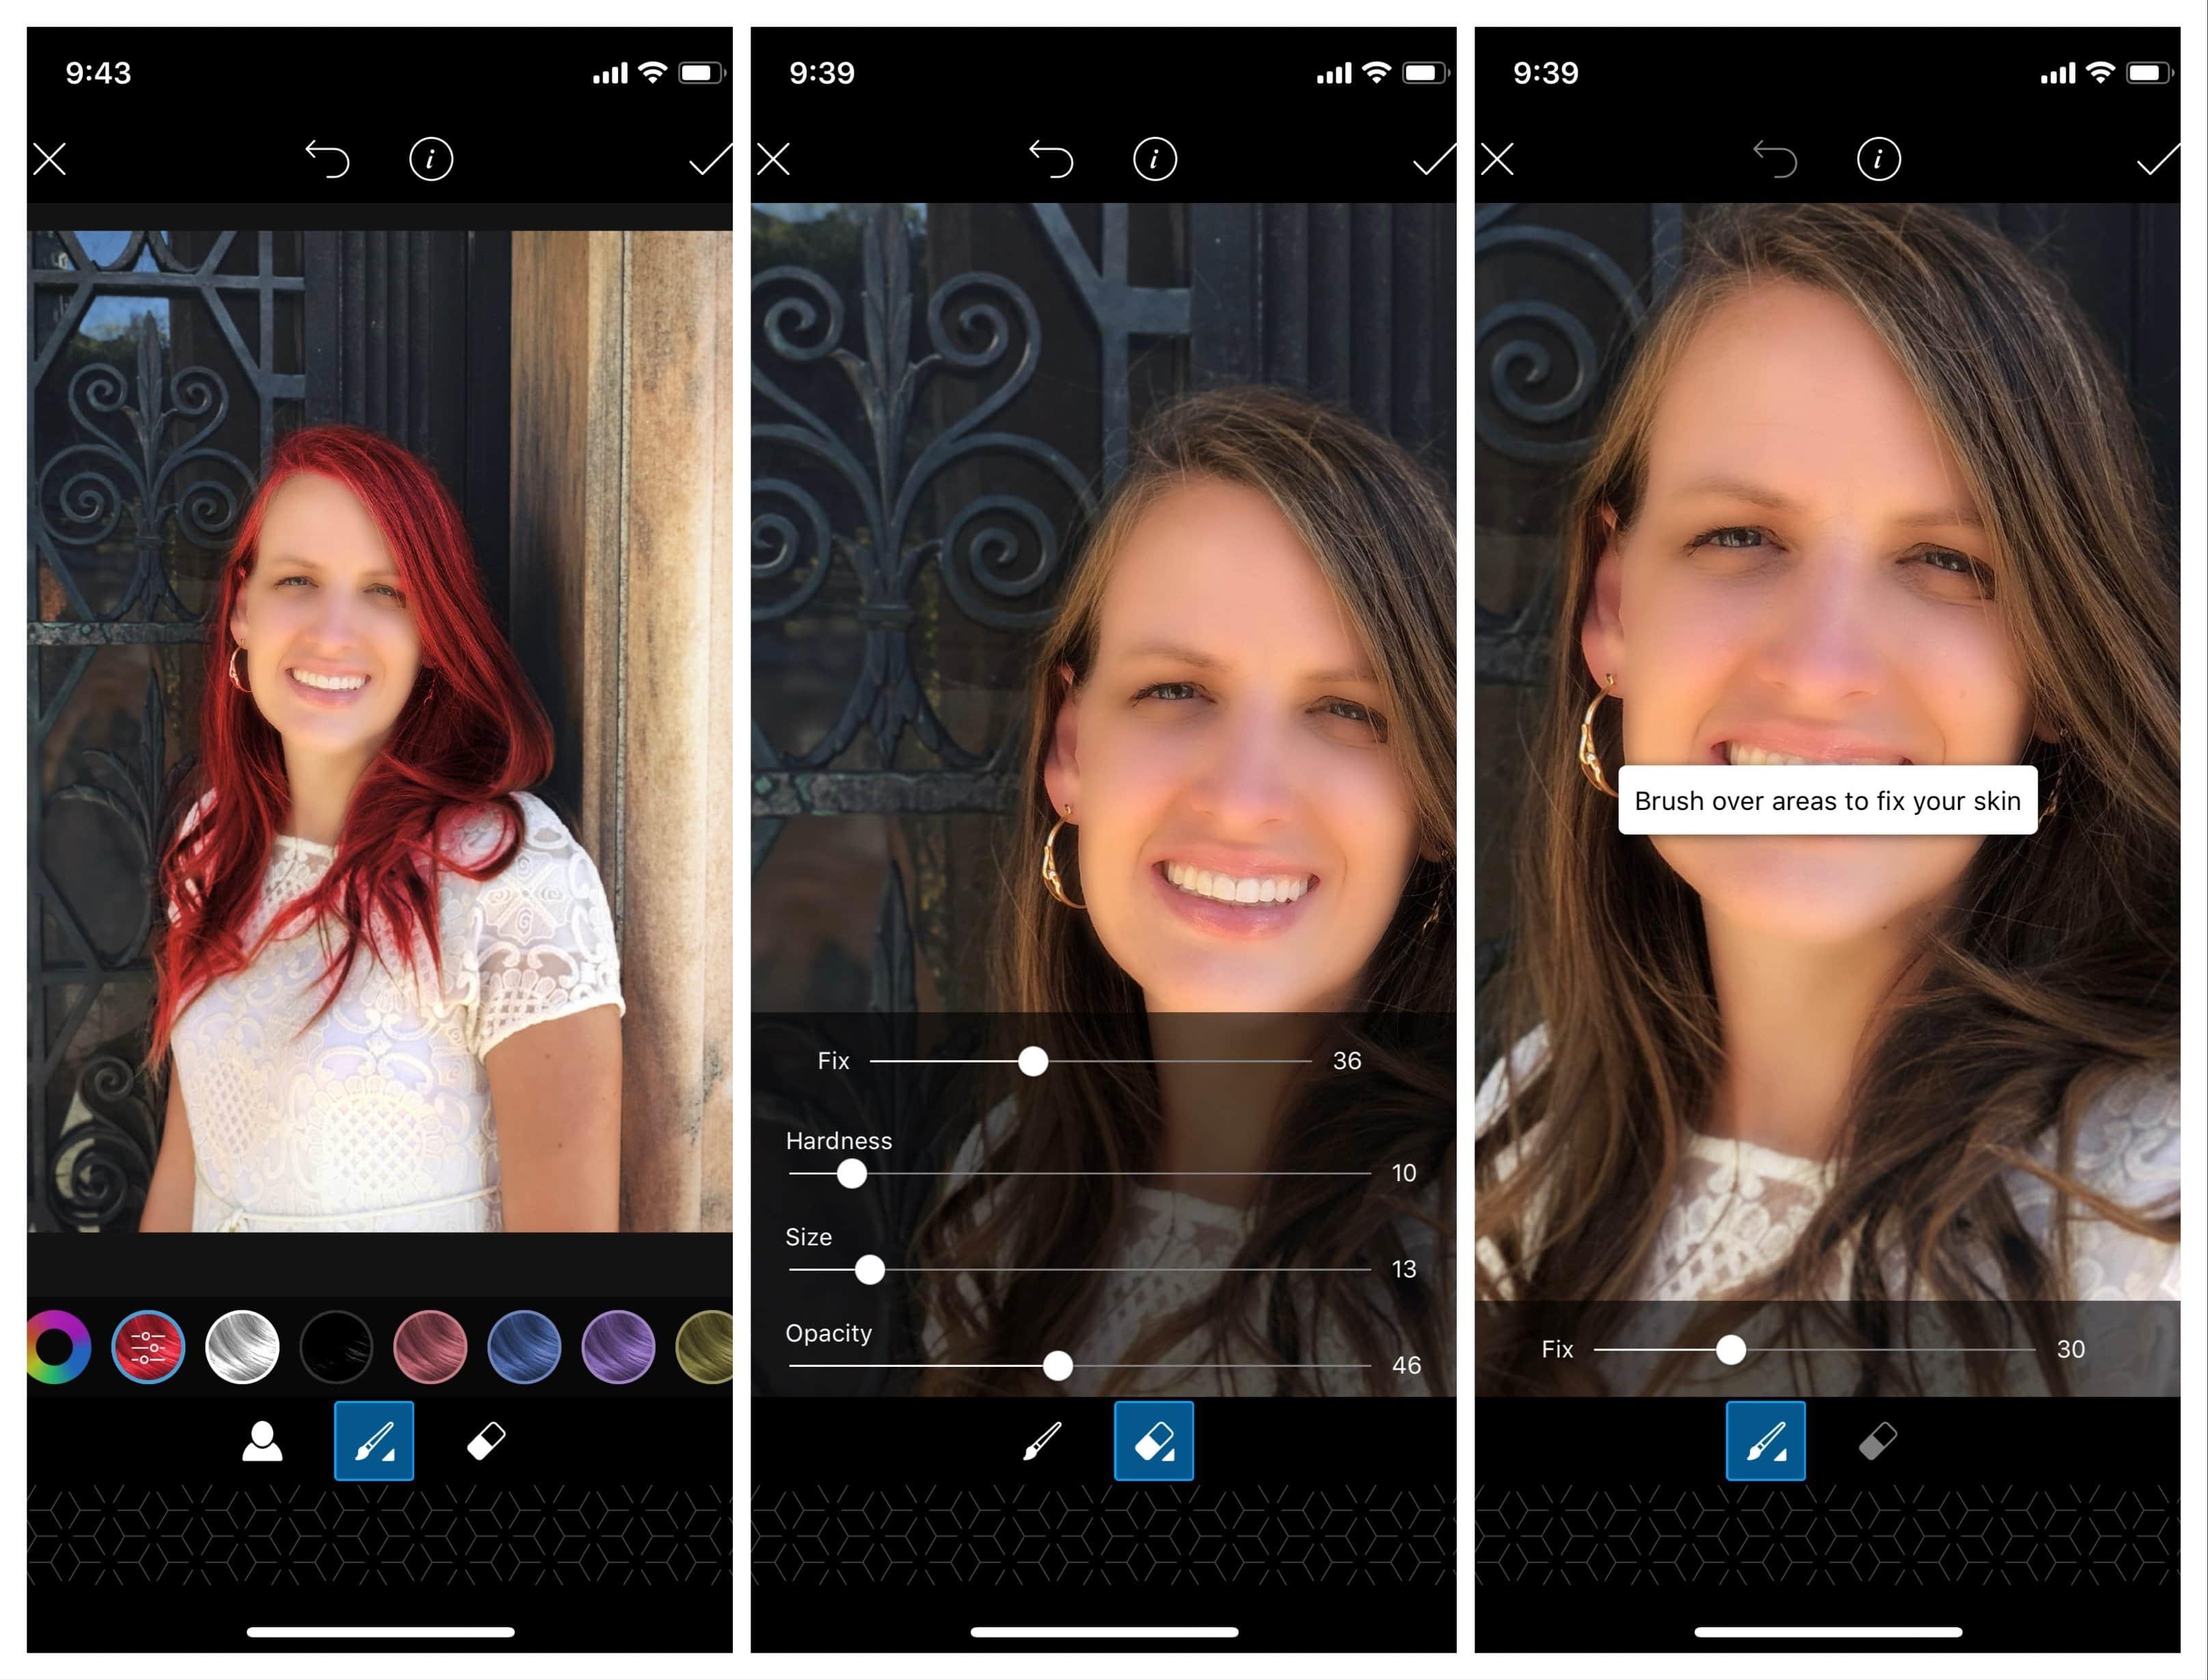 Beautify PicsArt Editing App